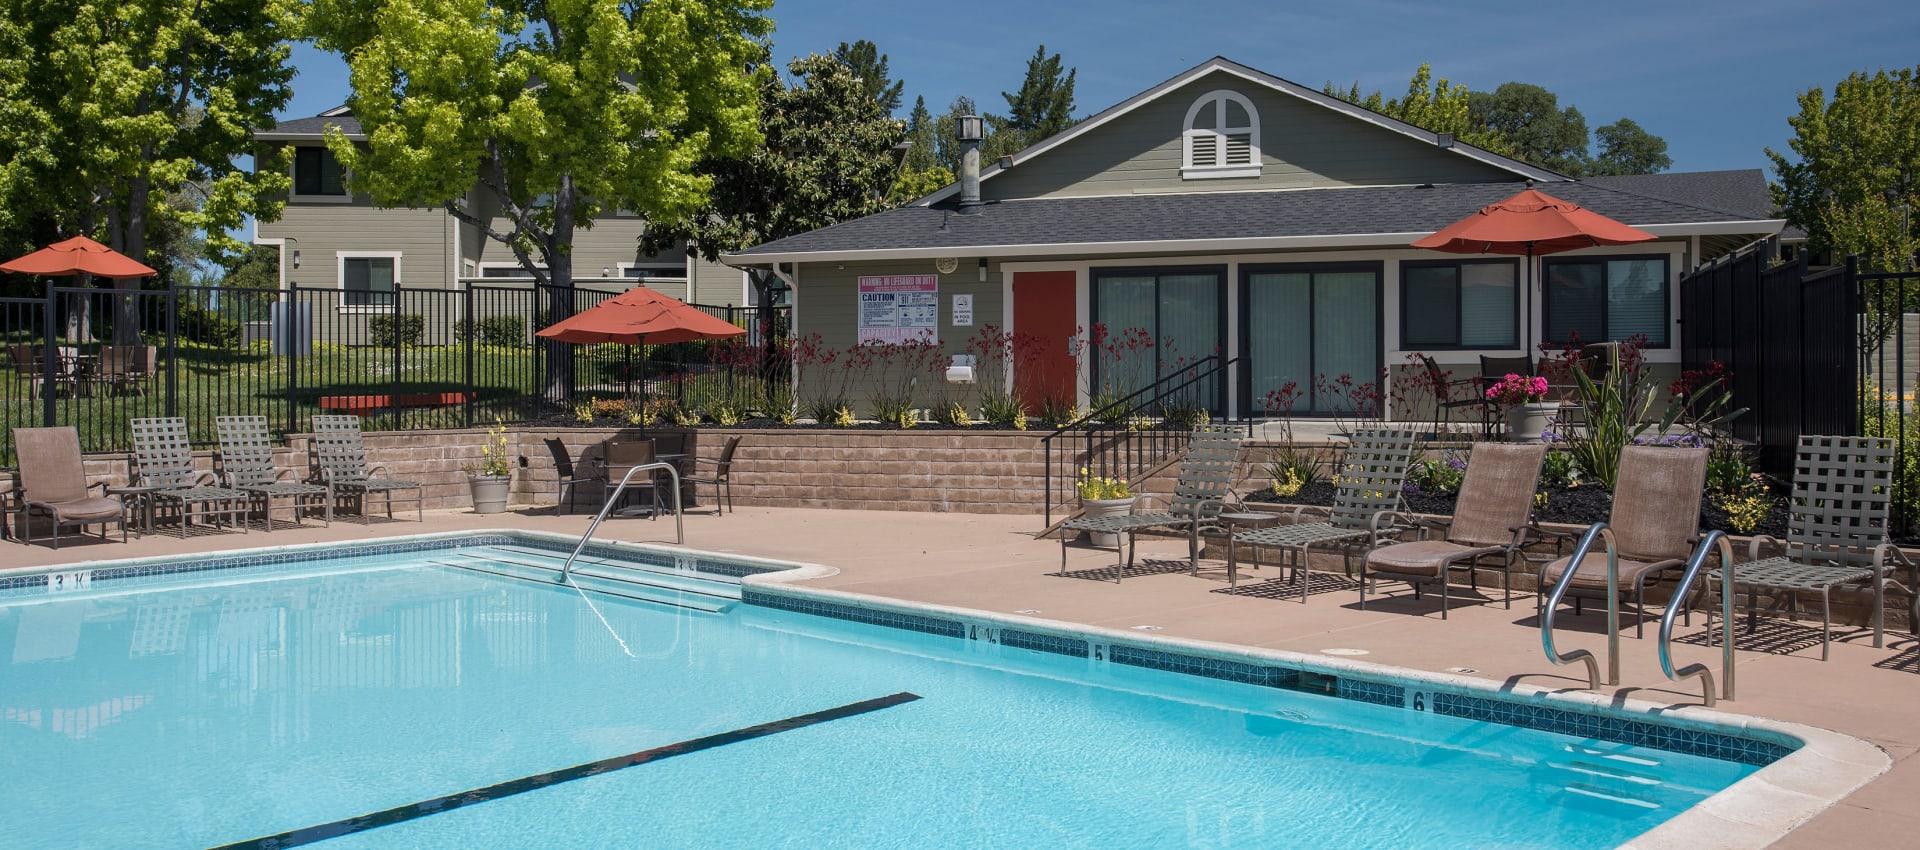 Large swimming pool at Ridgecrest Apartment Homes in Martinez, California